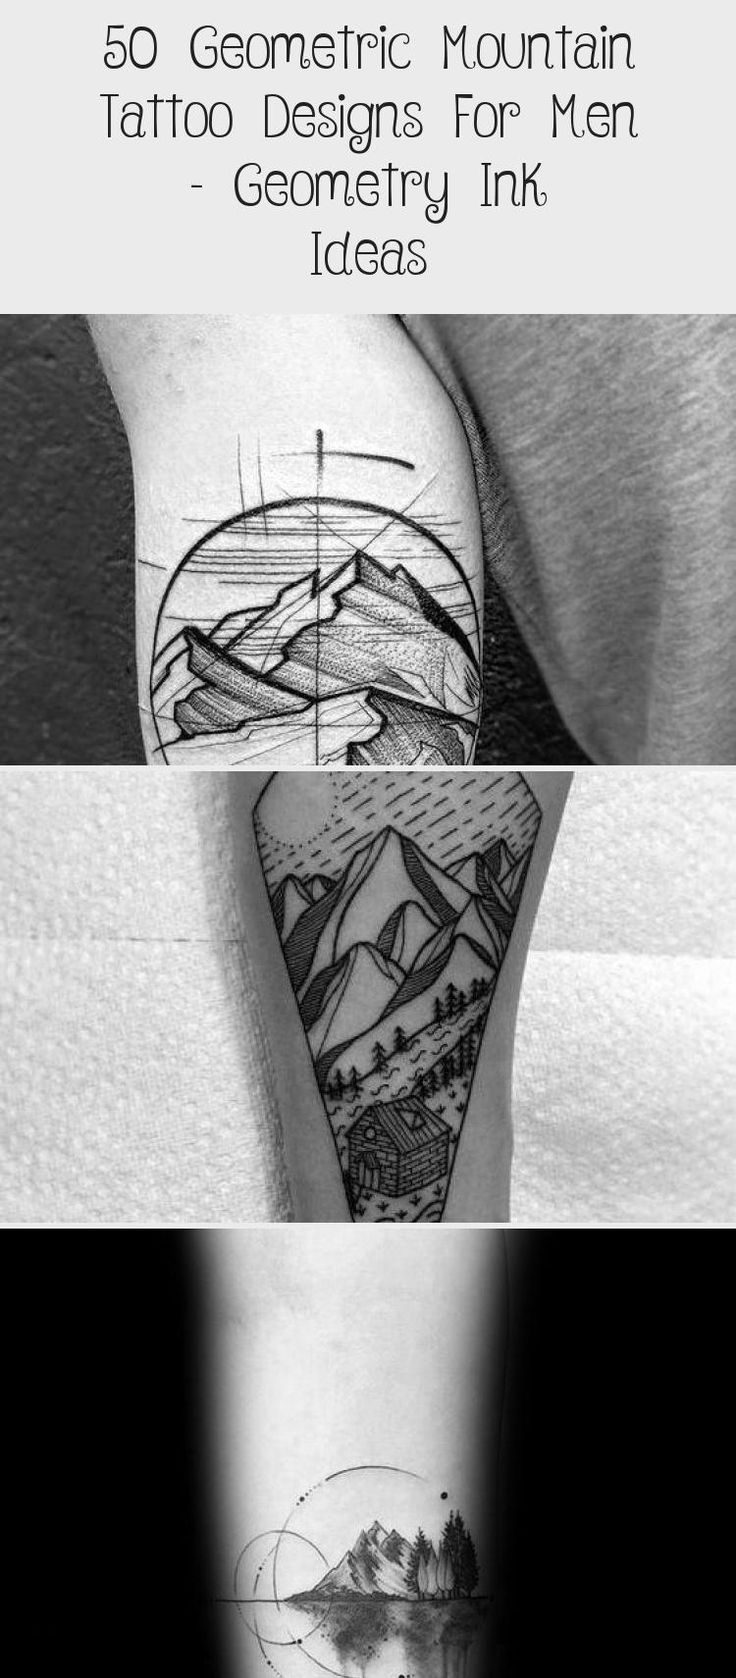 Gentleman With Geometric Mountain Tattoo